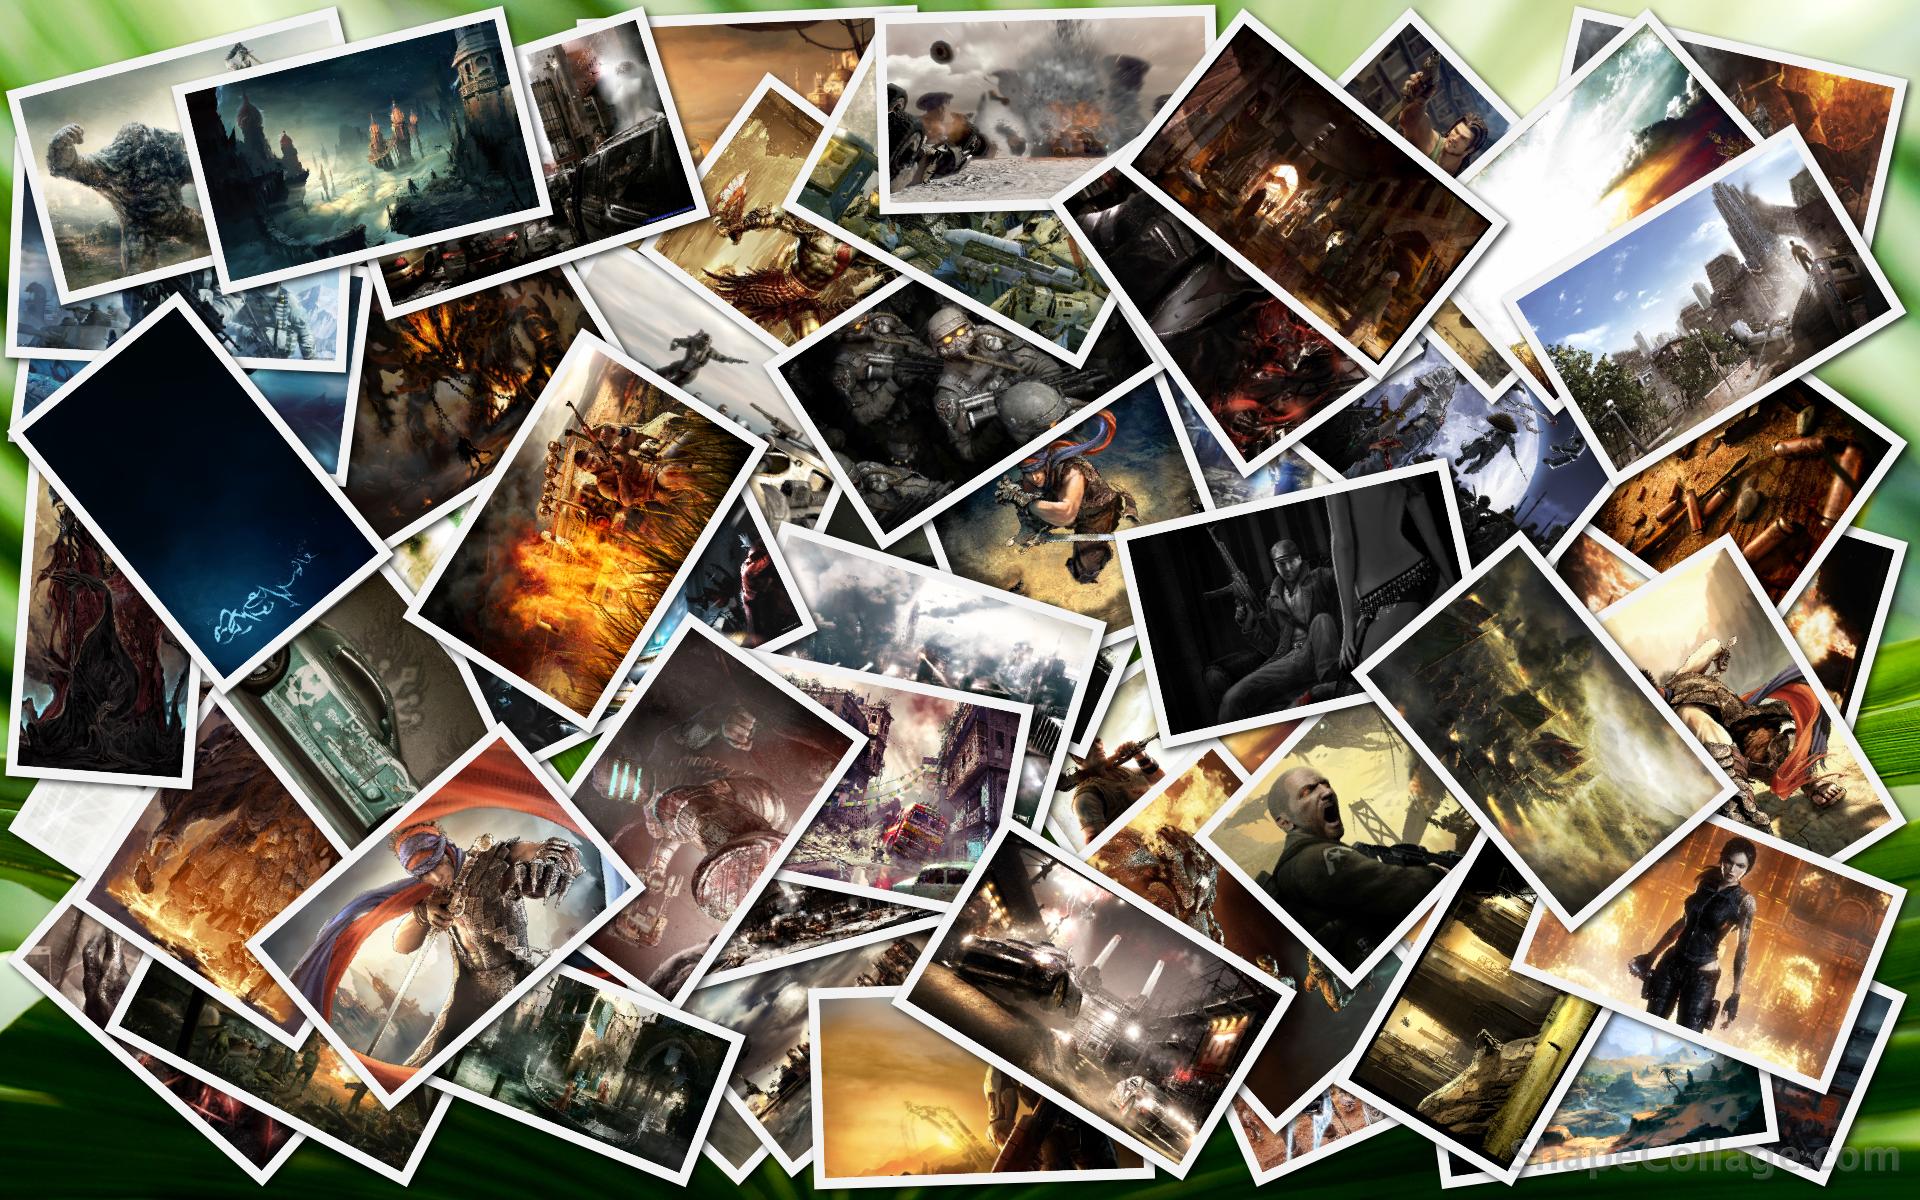 wallpaper-collage-game-flostyler-art-resolution-94758